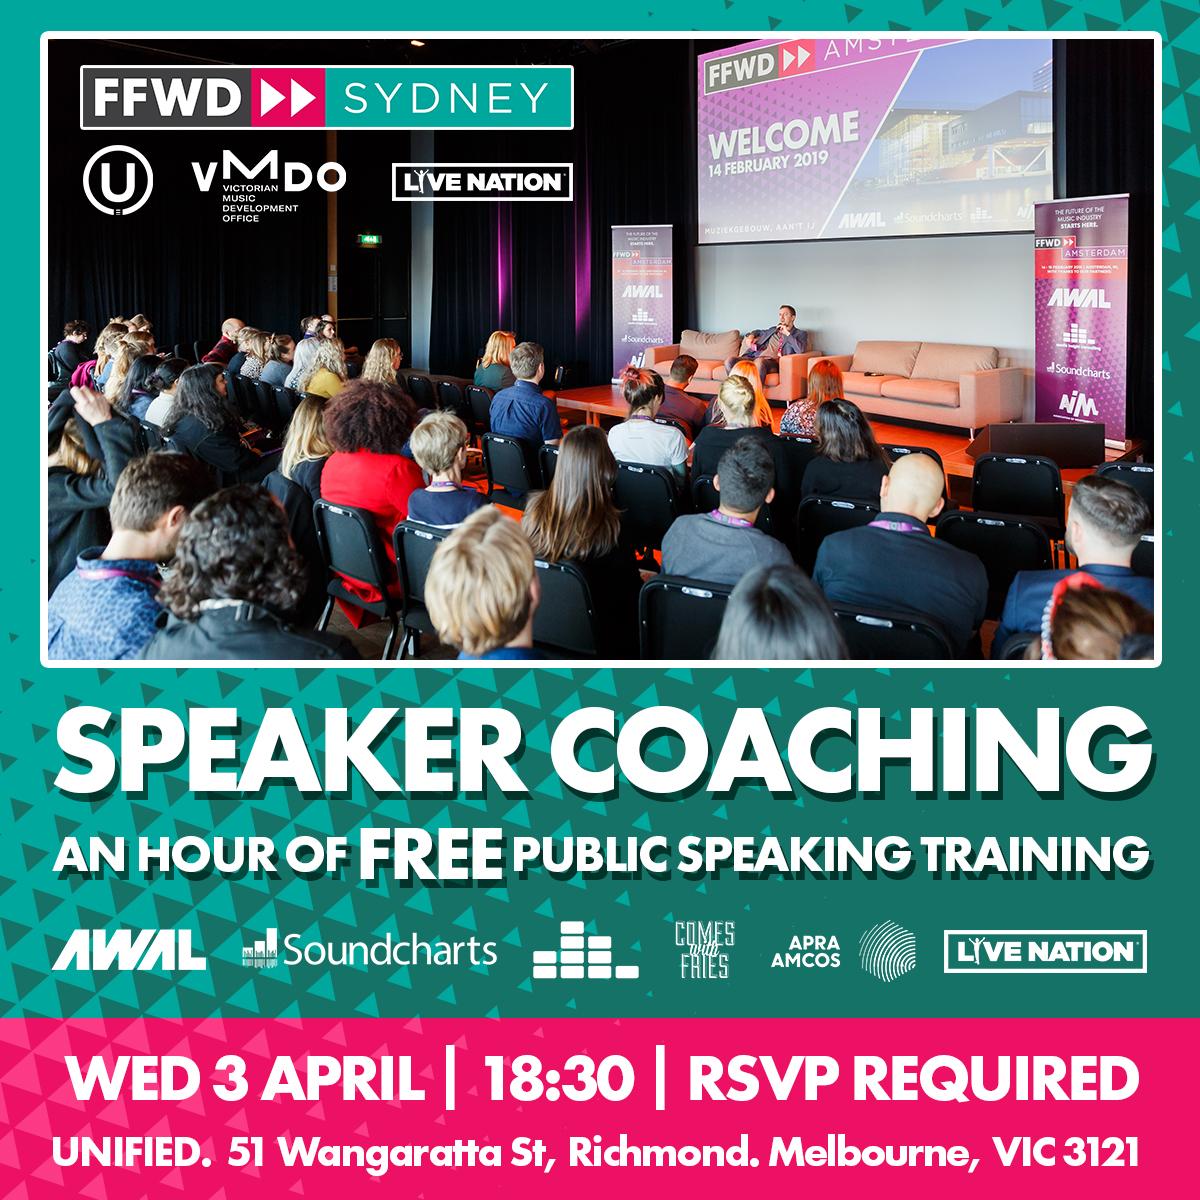 FFWD Sydney  Speaker Coaching  Square  2.jpg